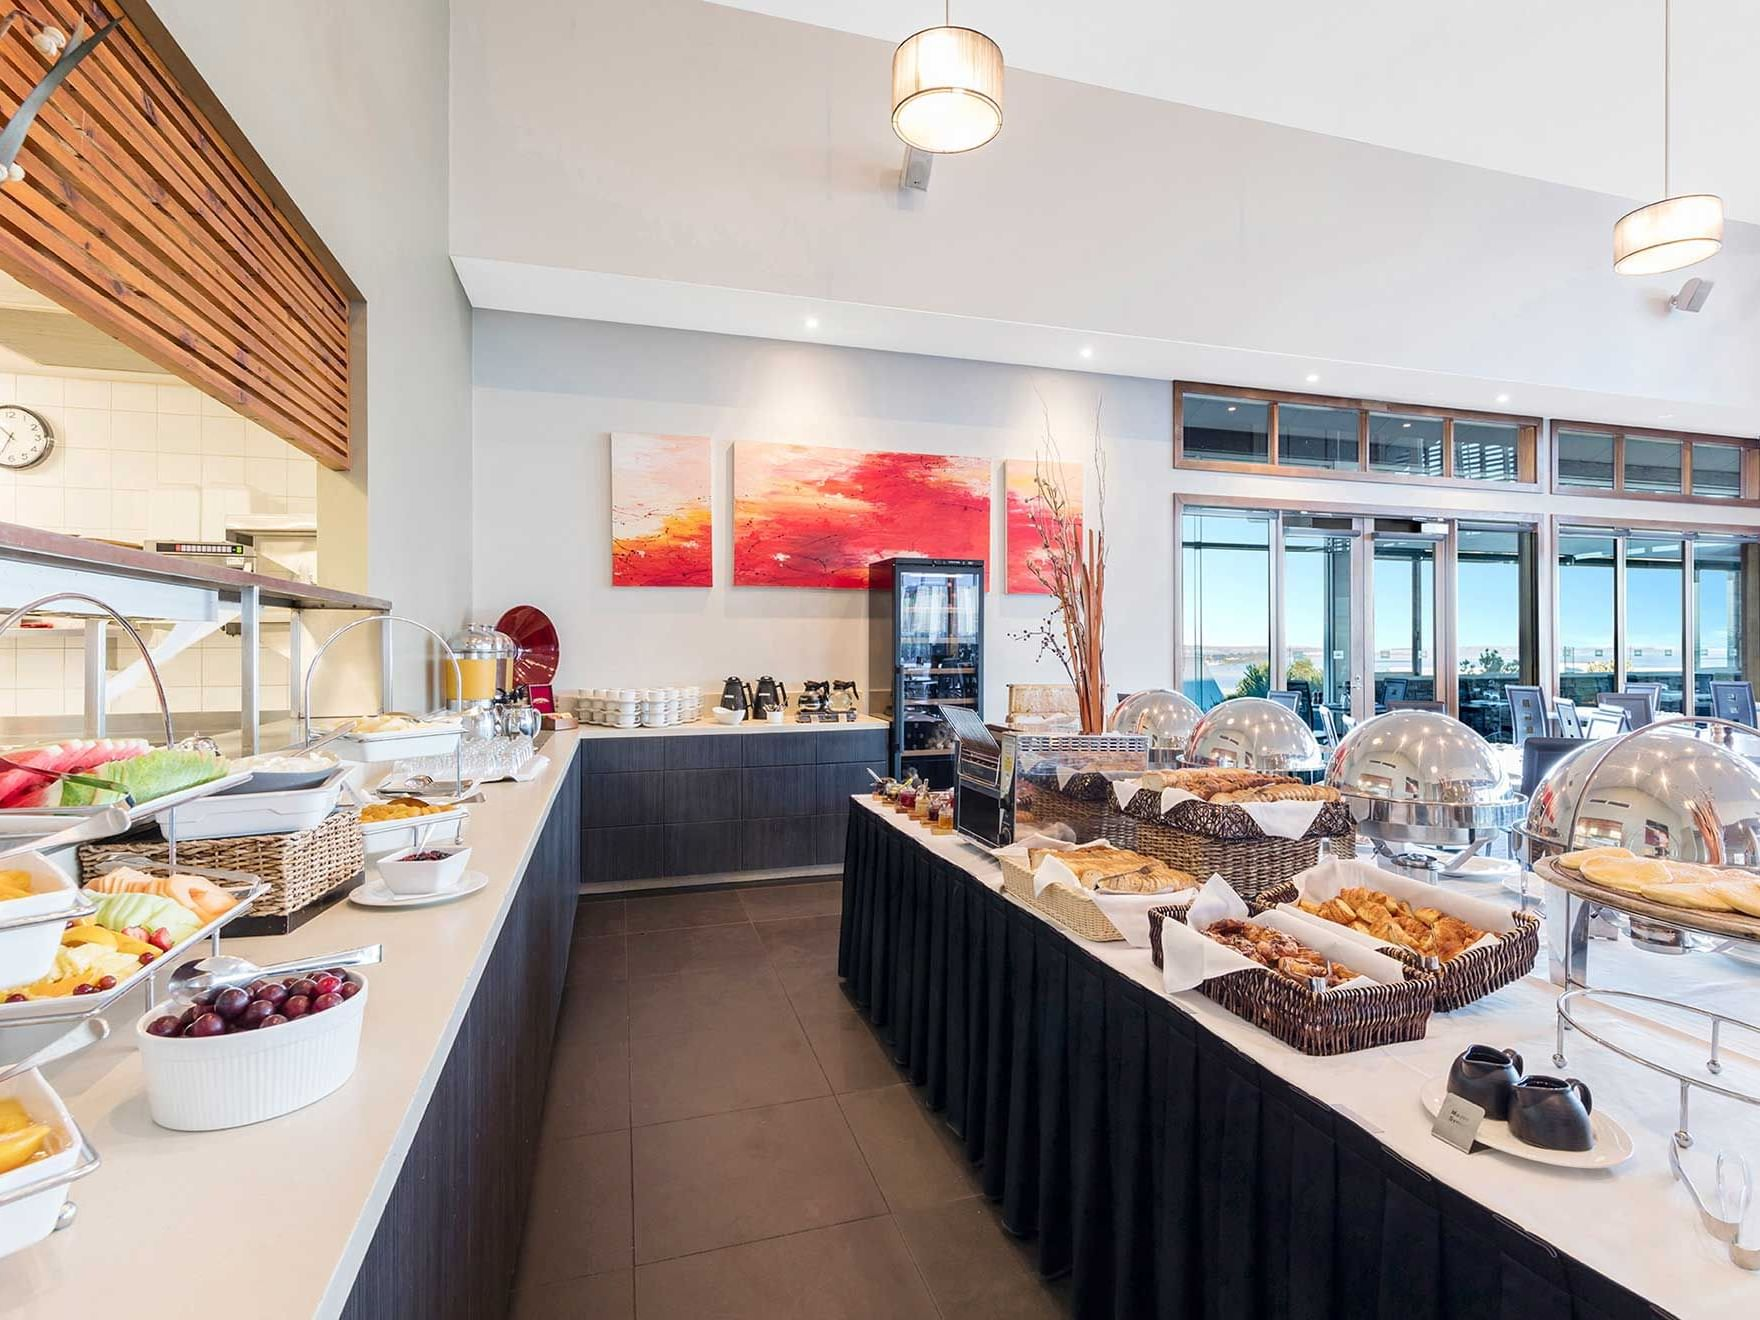 buffet spread in Watermark Restaurant at Silverwater Resort